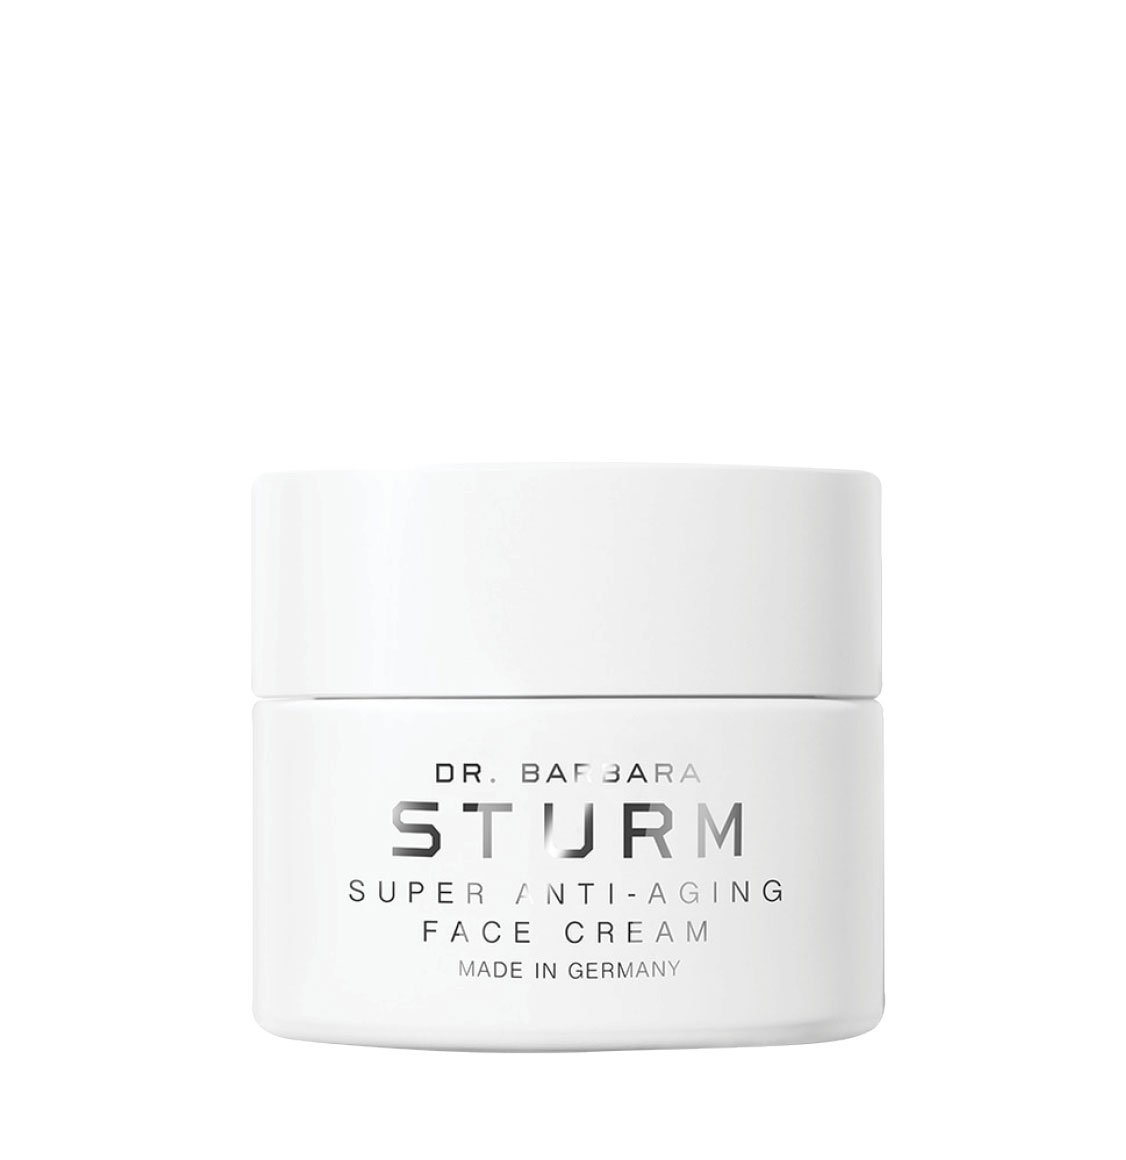 Dr. Barbara Sturm Super Anti-Aging Face Cream 50ml